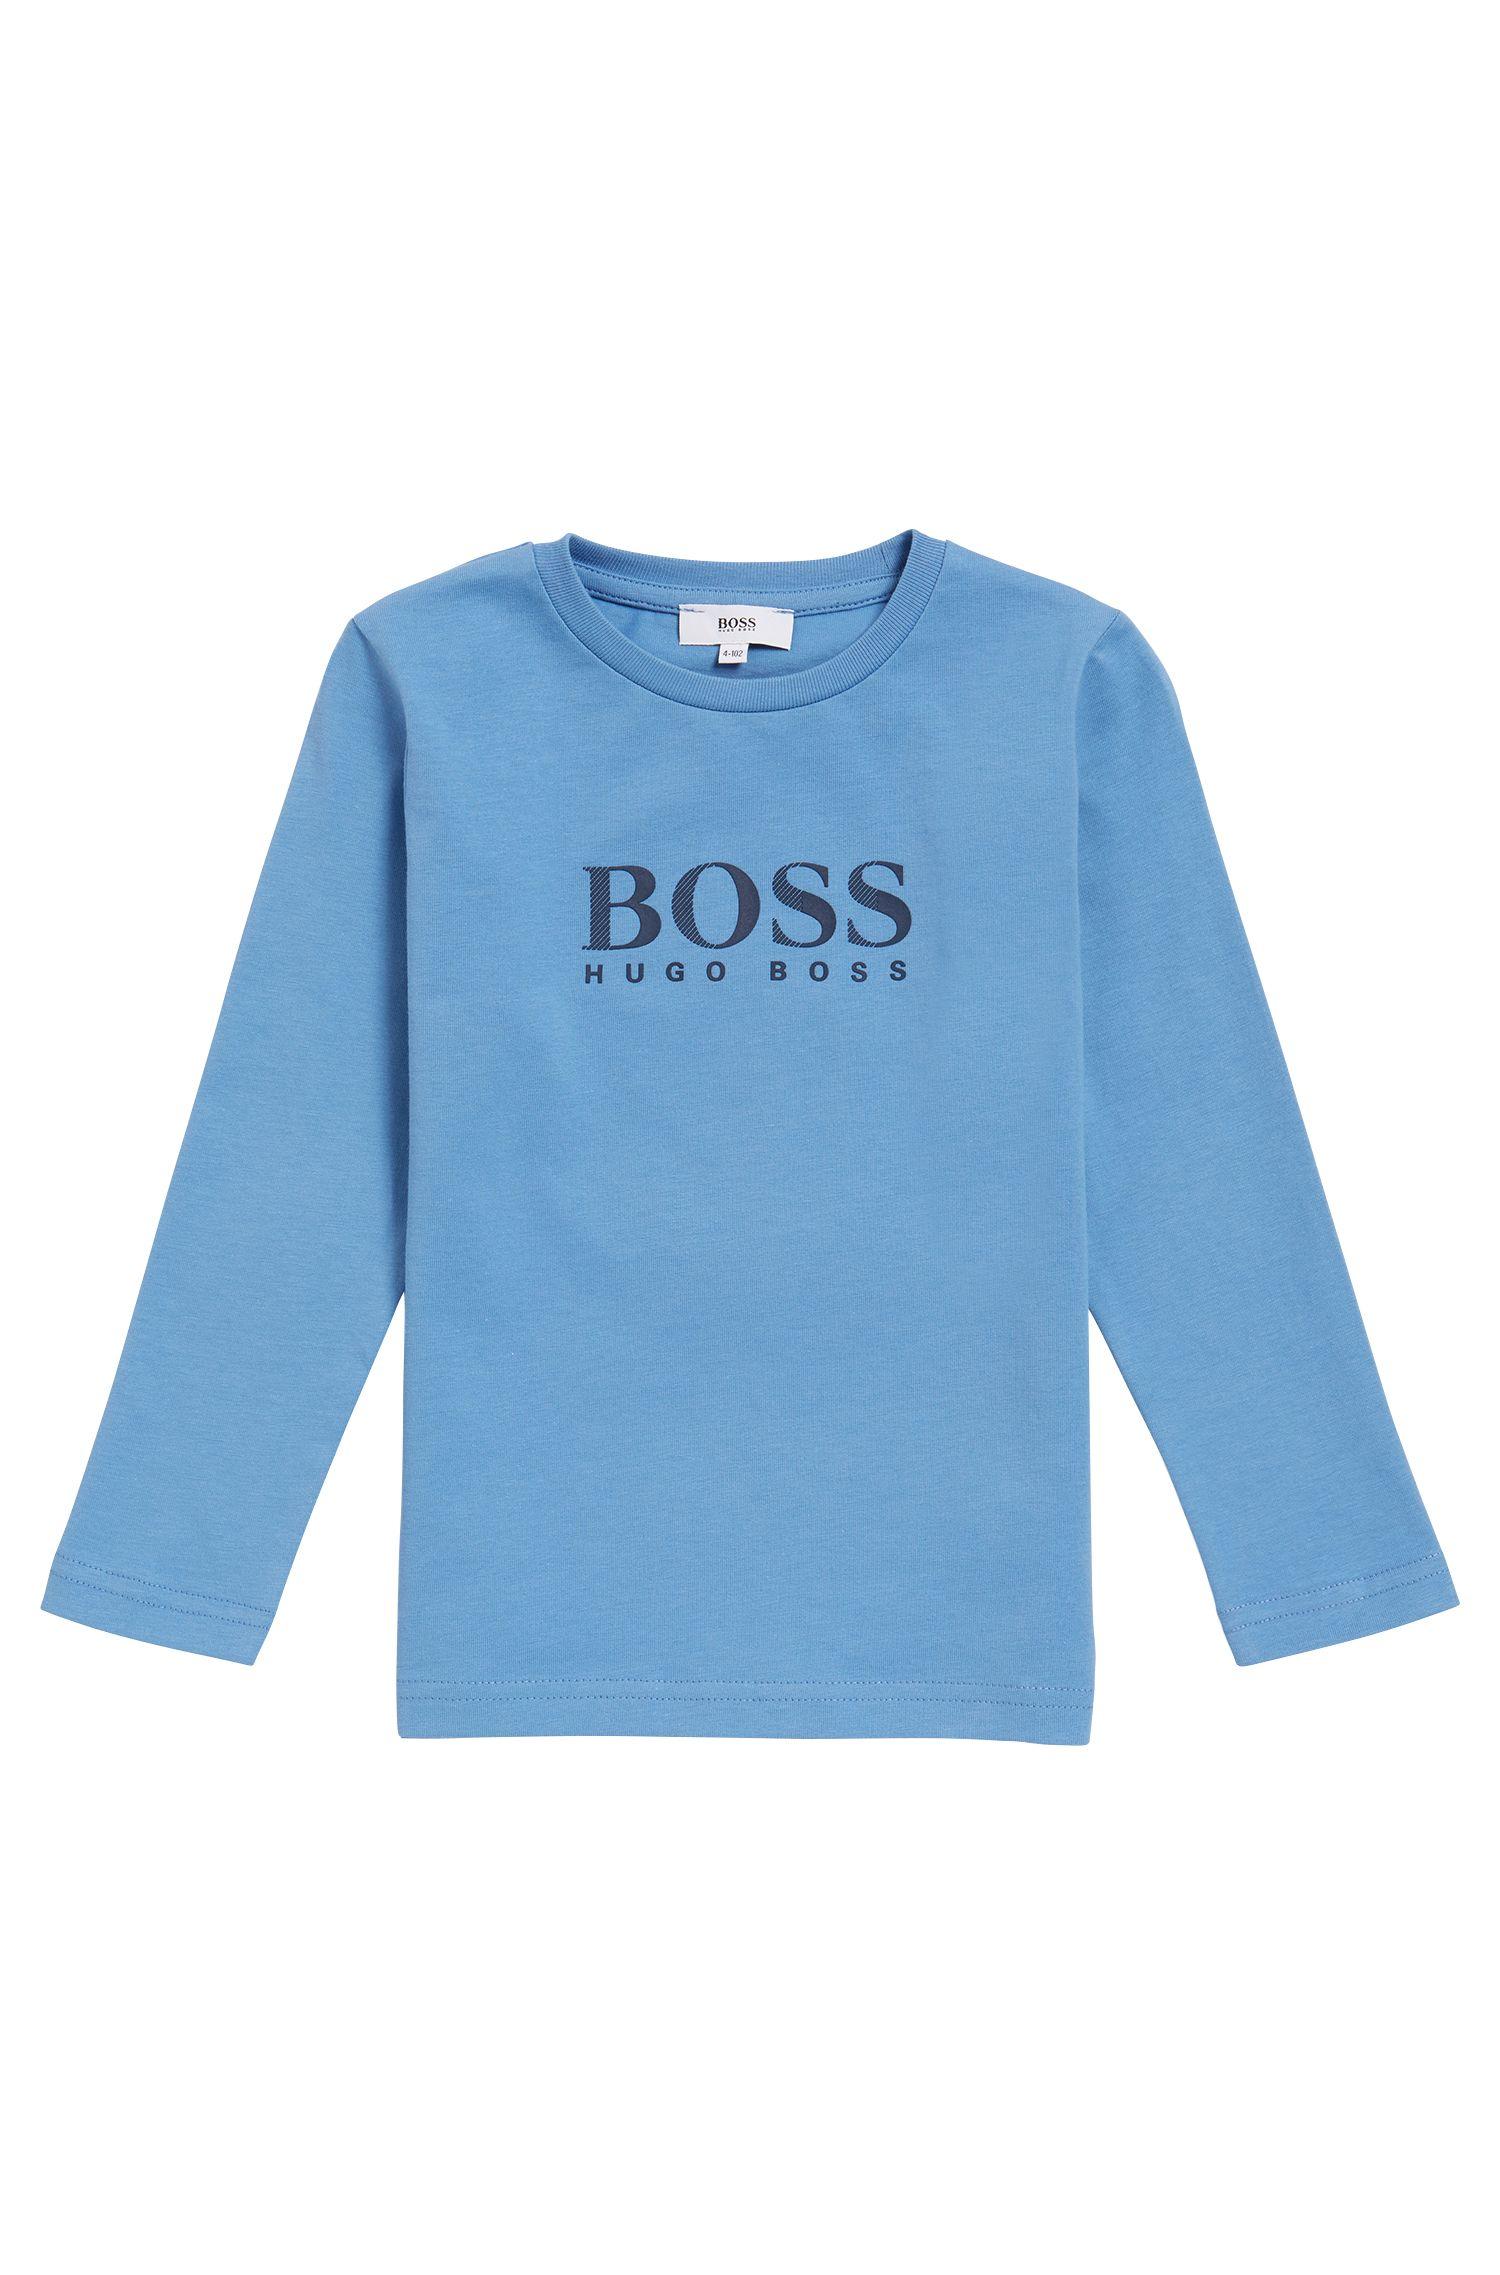 Kids-Longsleeve aus Baumwoll-Jersey mit Logo-Print, Hellblau